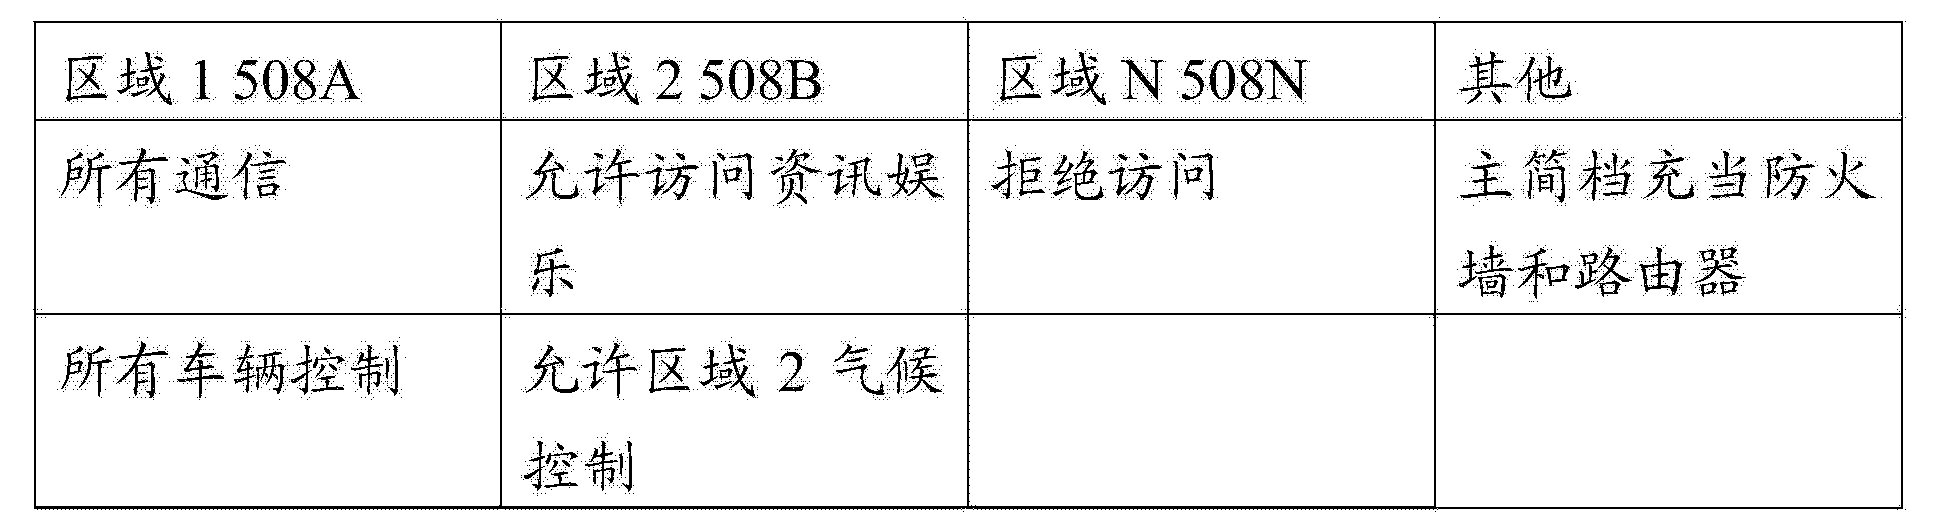 Figure CN104520676AD00321